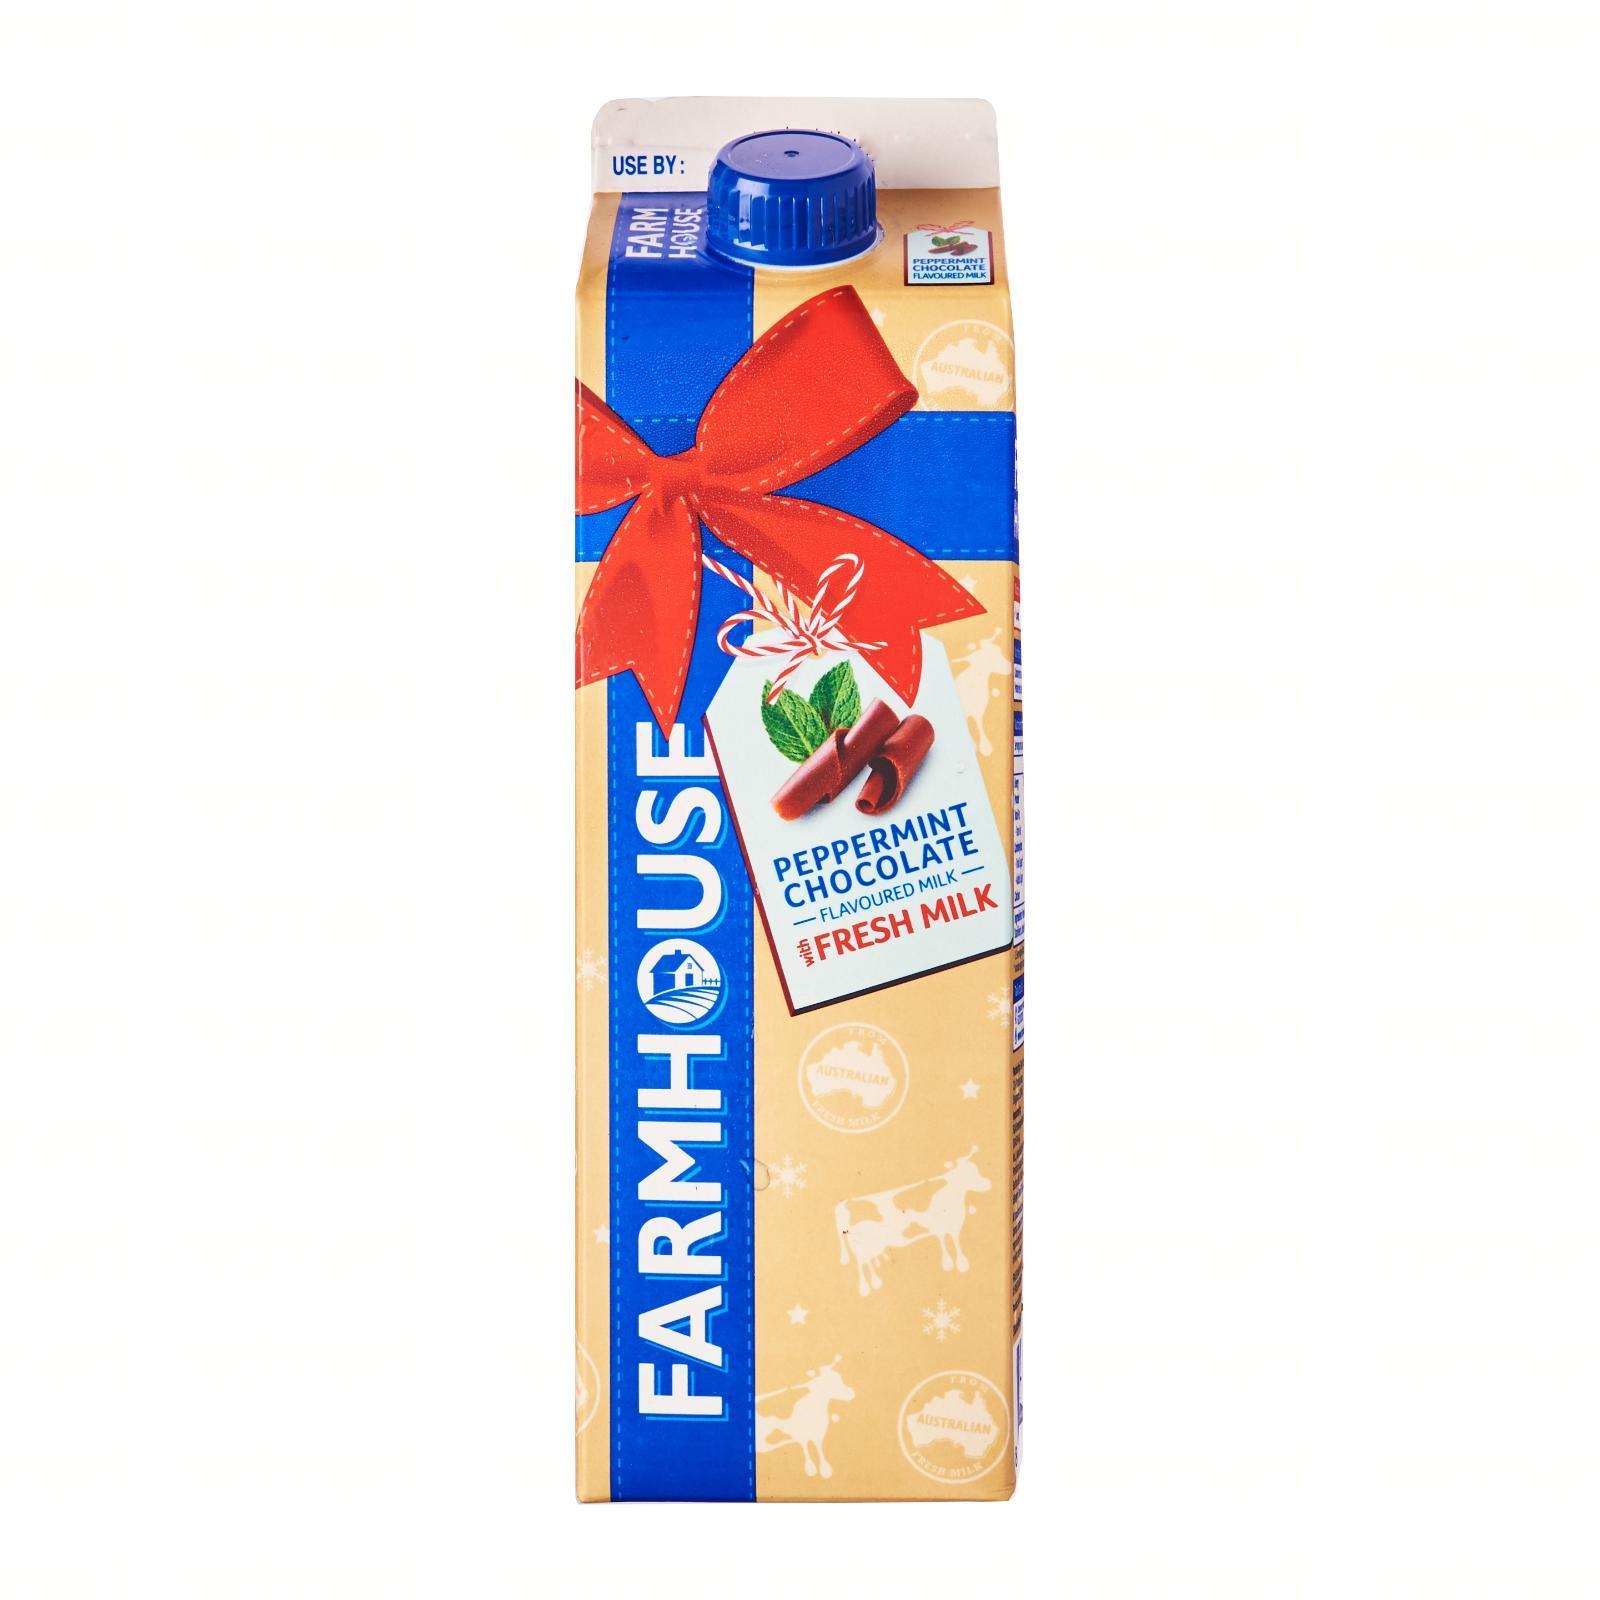 Farmhouse Peppermint Chocolate Flavoured Milk - Christmas Special